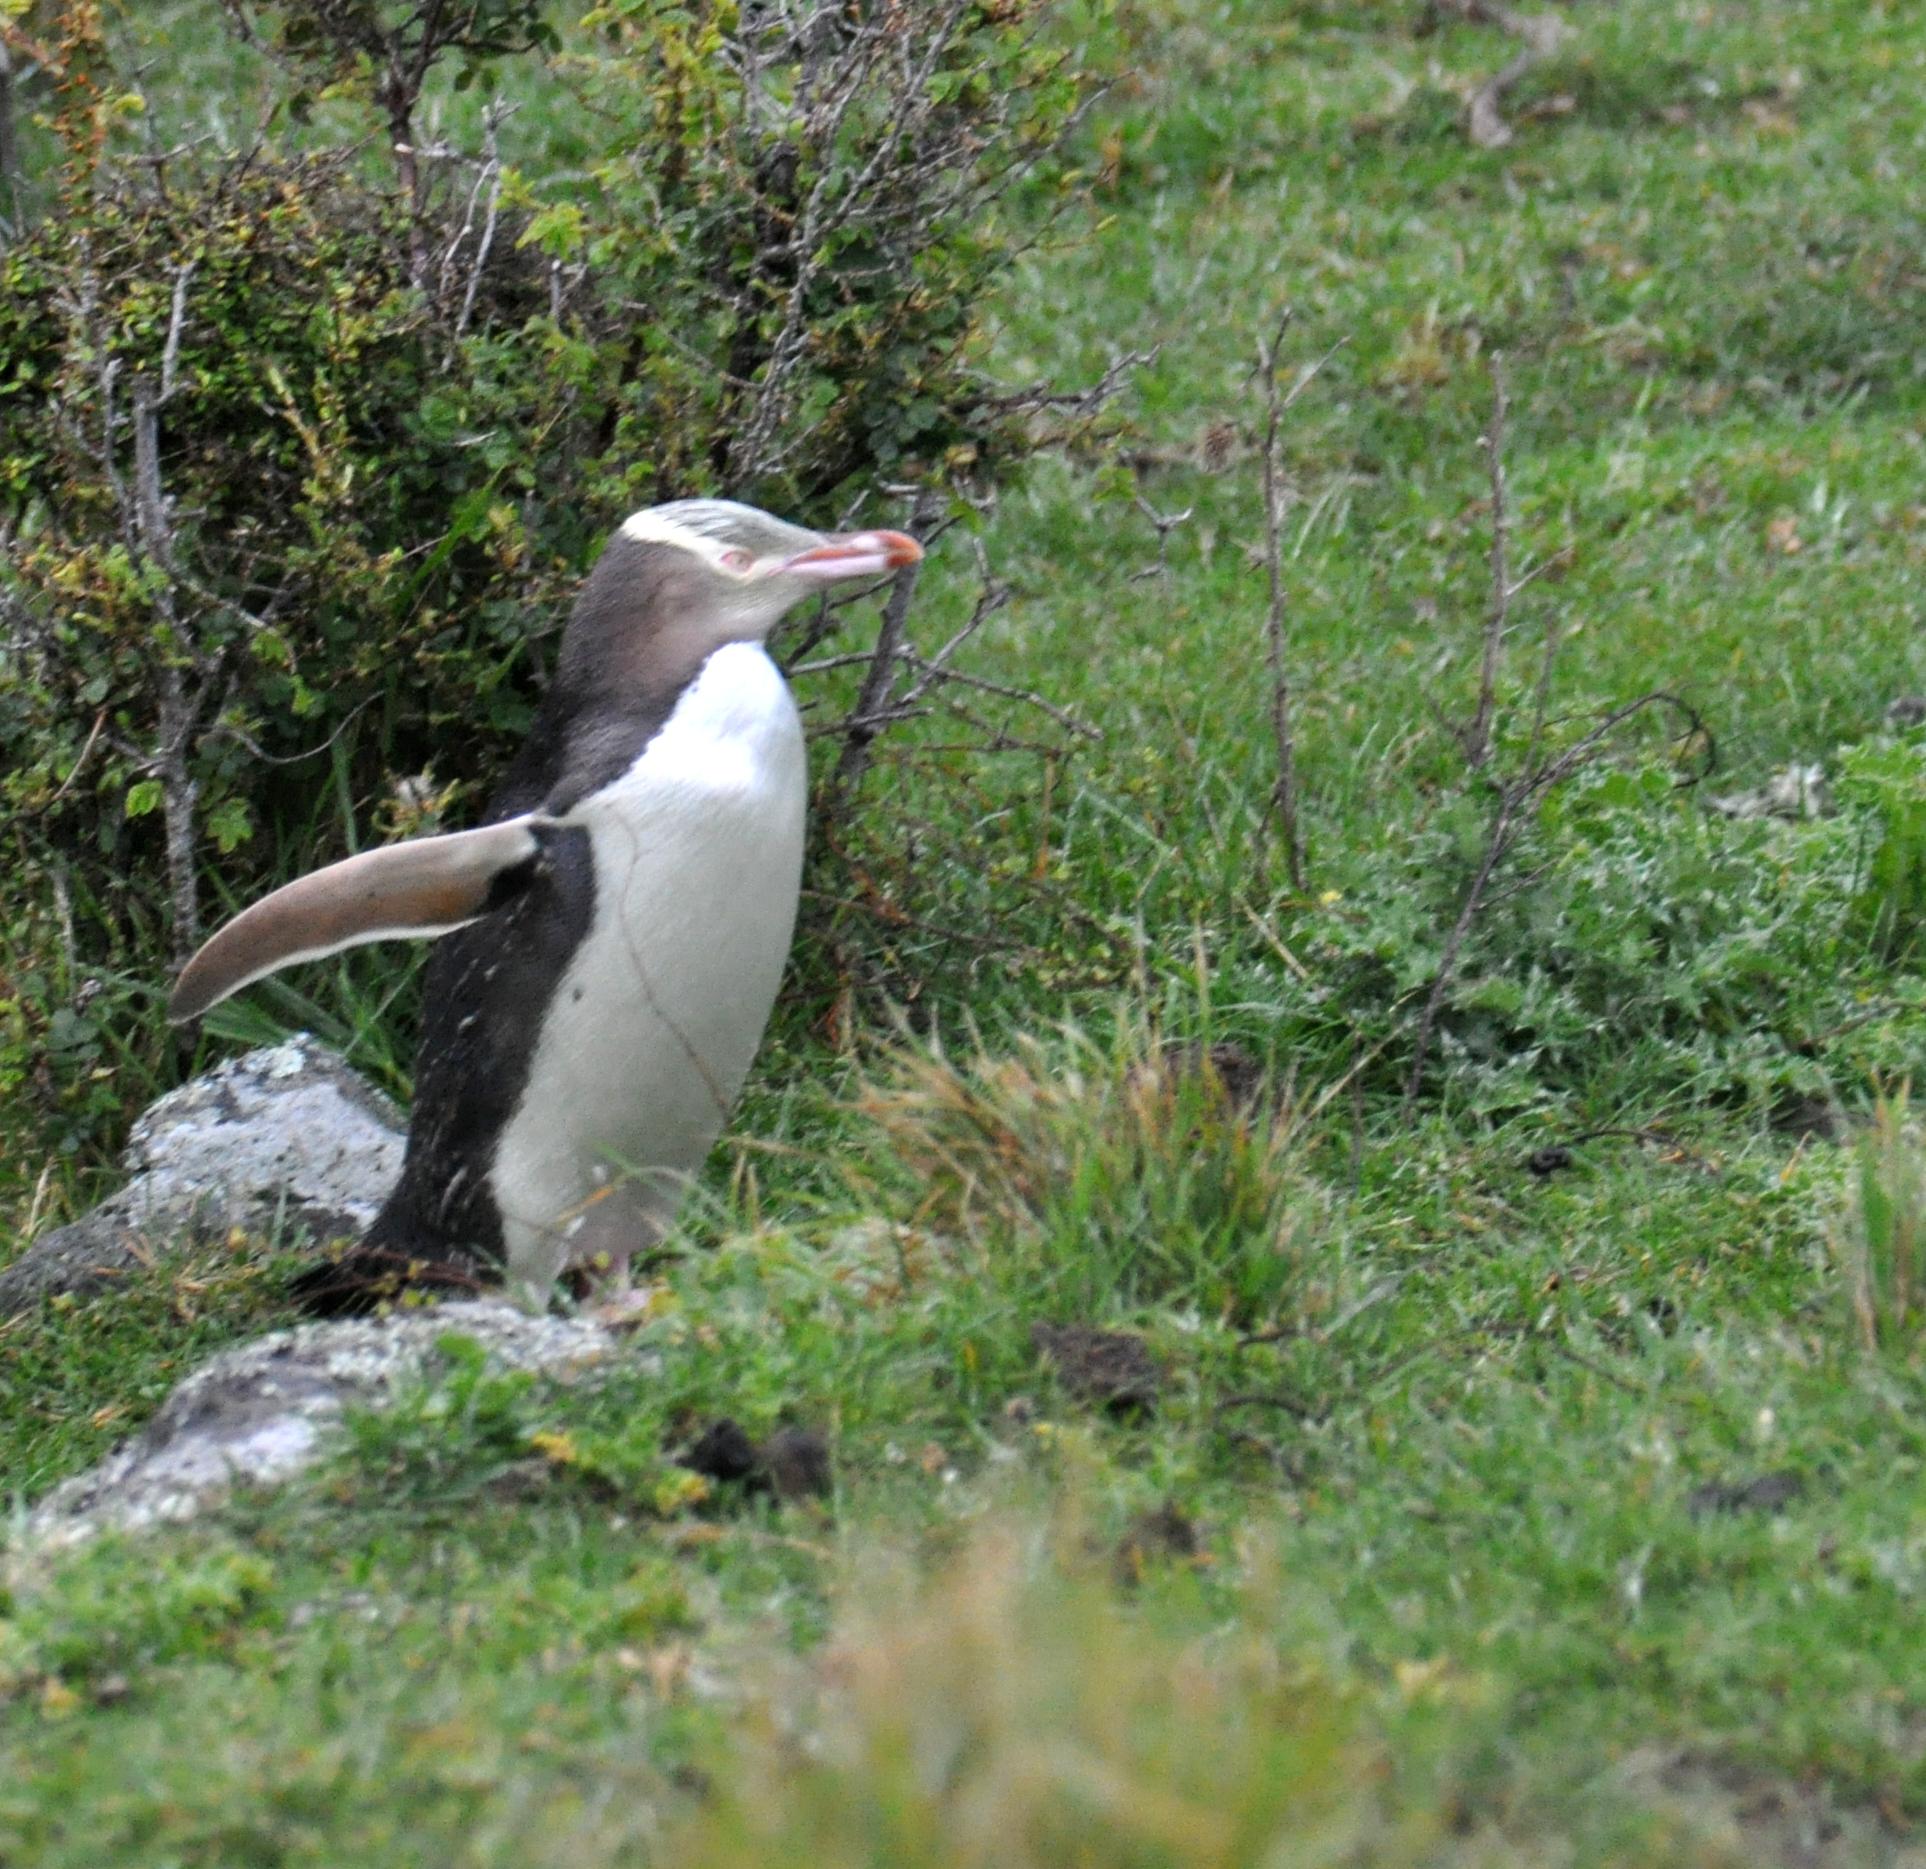 File:Yellow-eyed Penguin Banks Peninsula 1.jpg - Wikimedia Commons